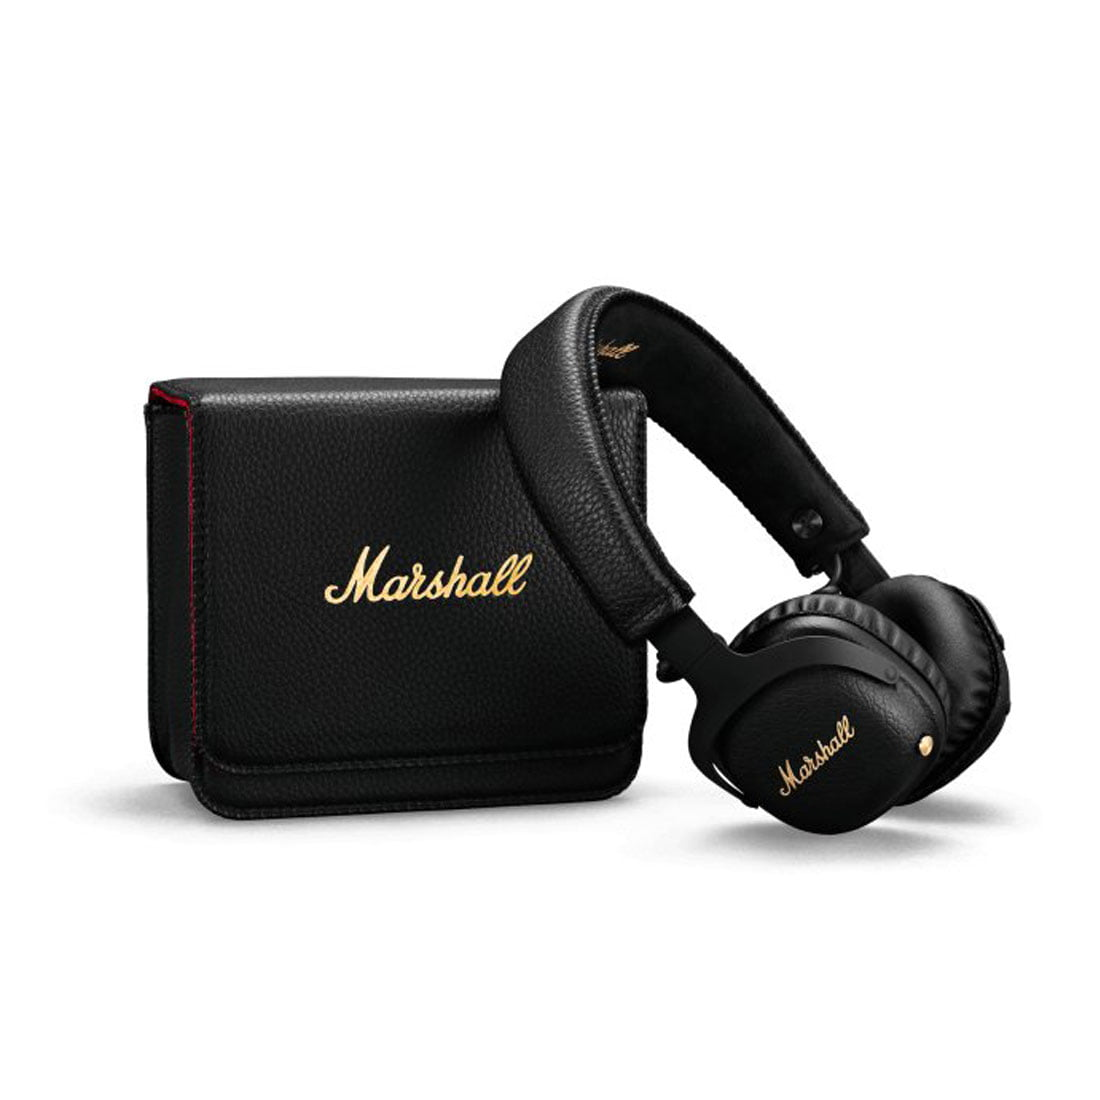 a2a2db502c7 Marshall Mid Bluetooth ANC Headphones Black SKU#04092138